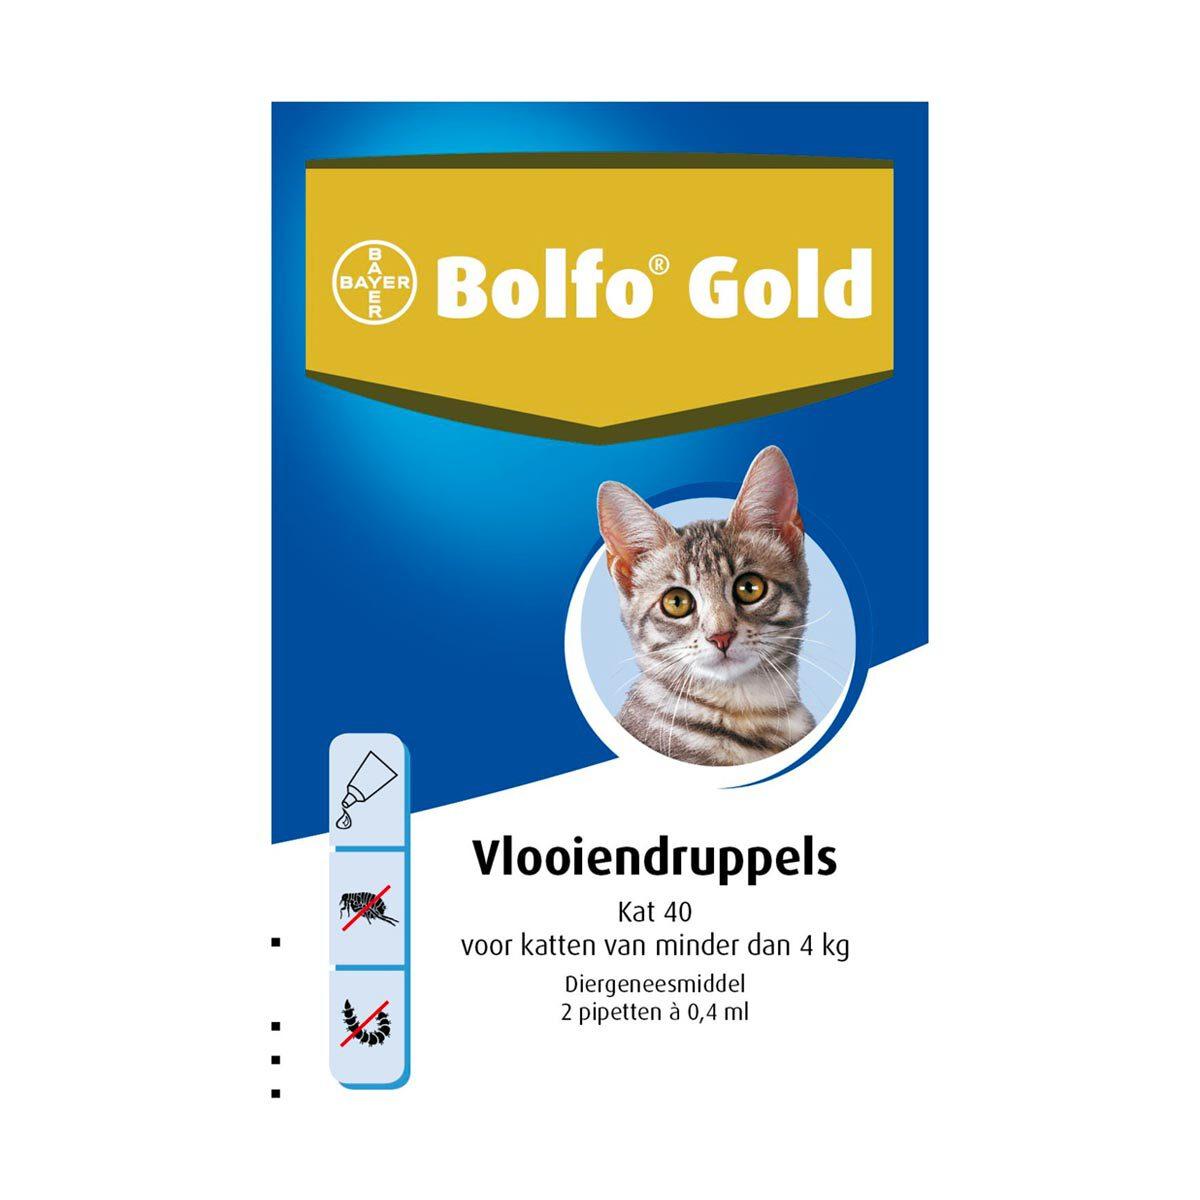 Bolfo Gold Kat 40 Vlooiendruppels van 0-4 kg 2 pipetten